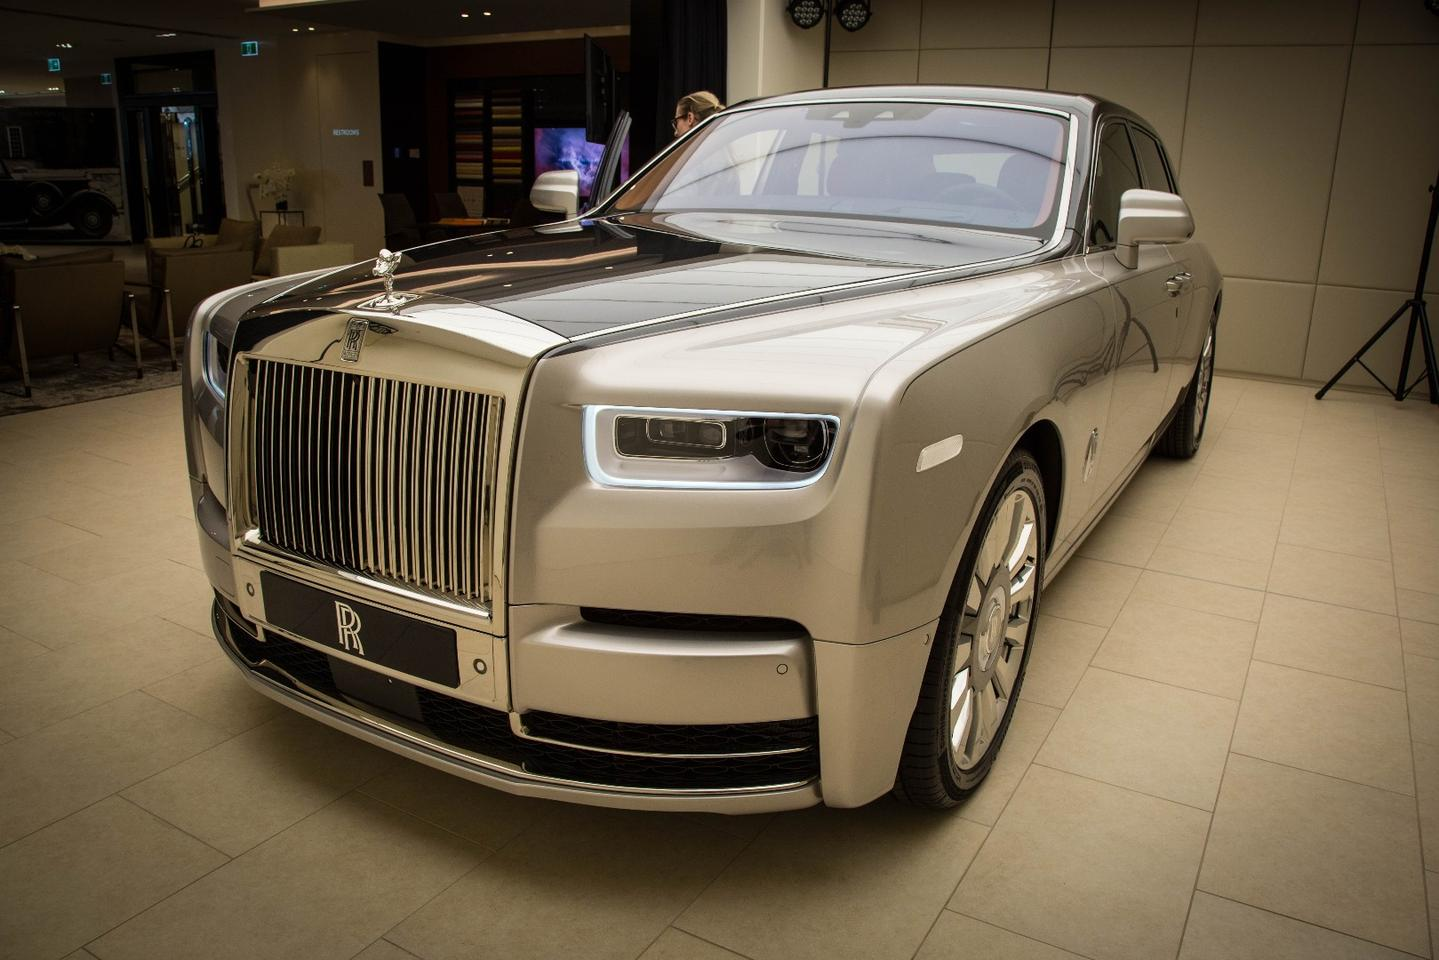 The nose of the new Rolls-Royce Phantom